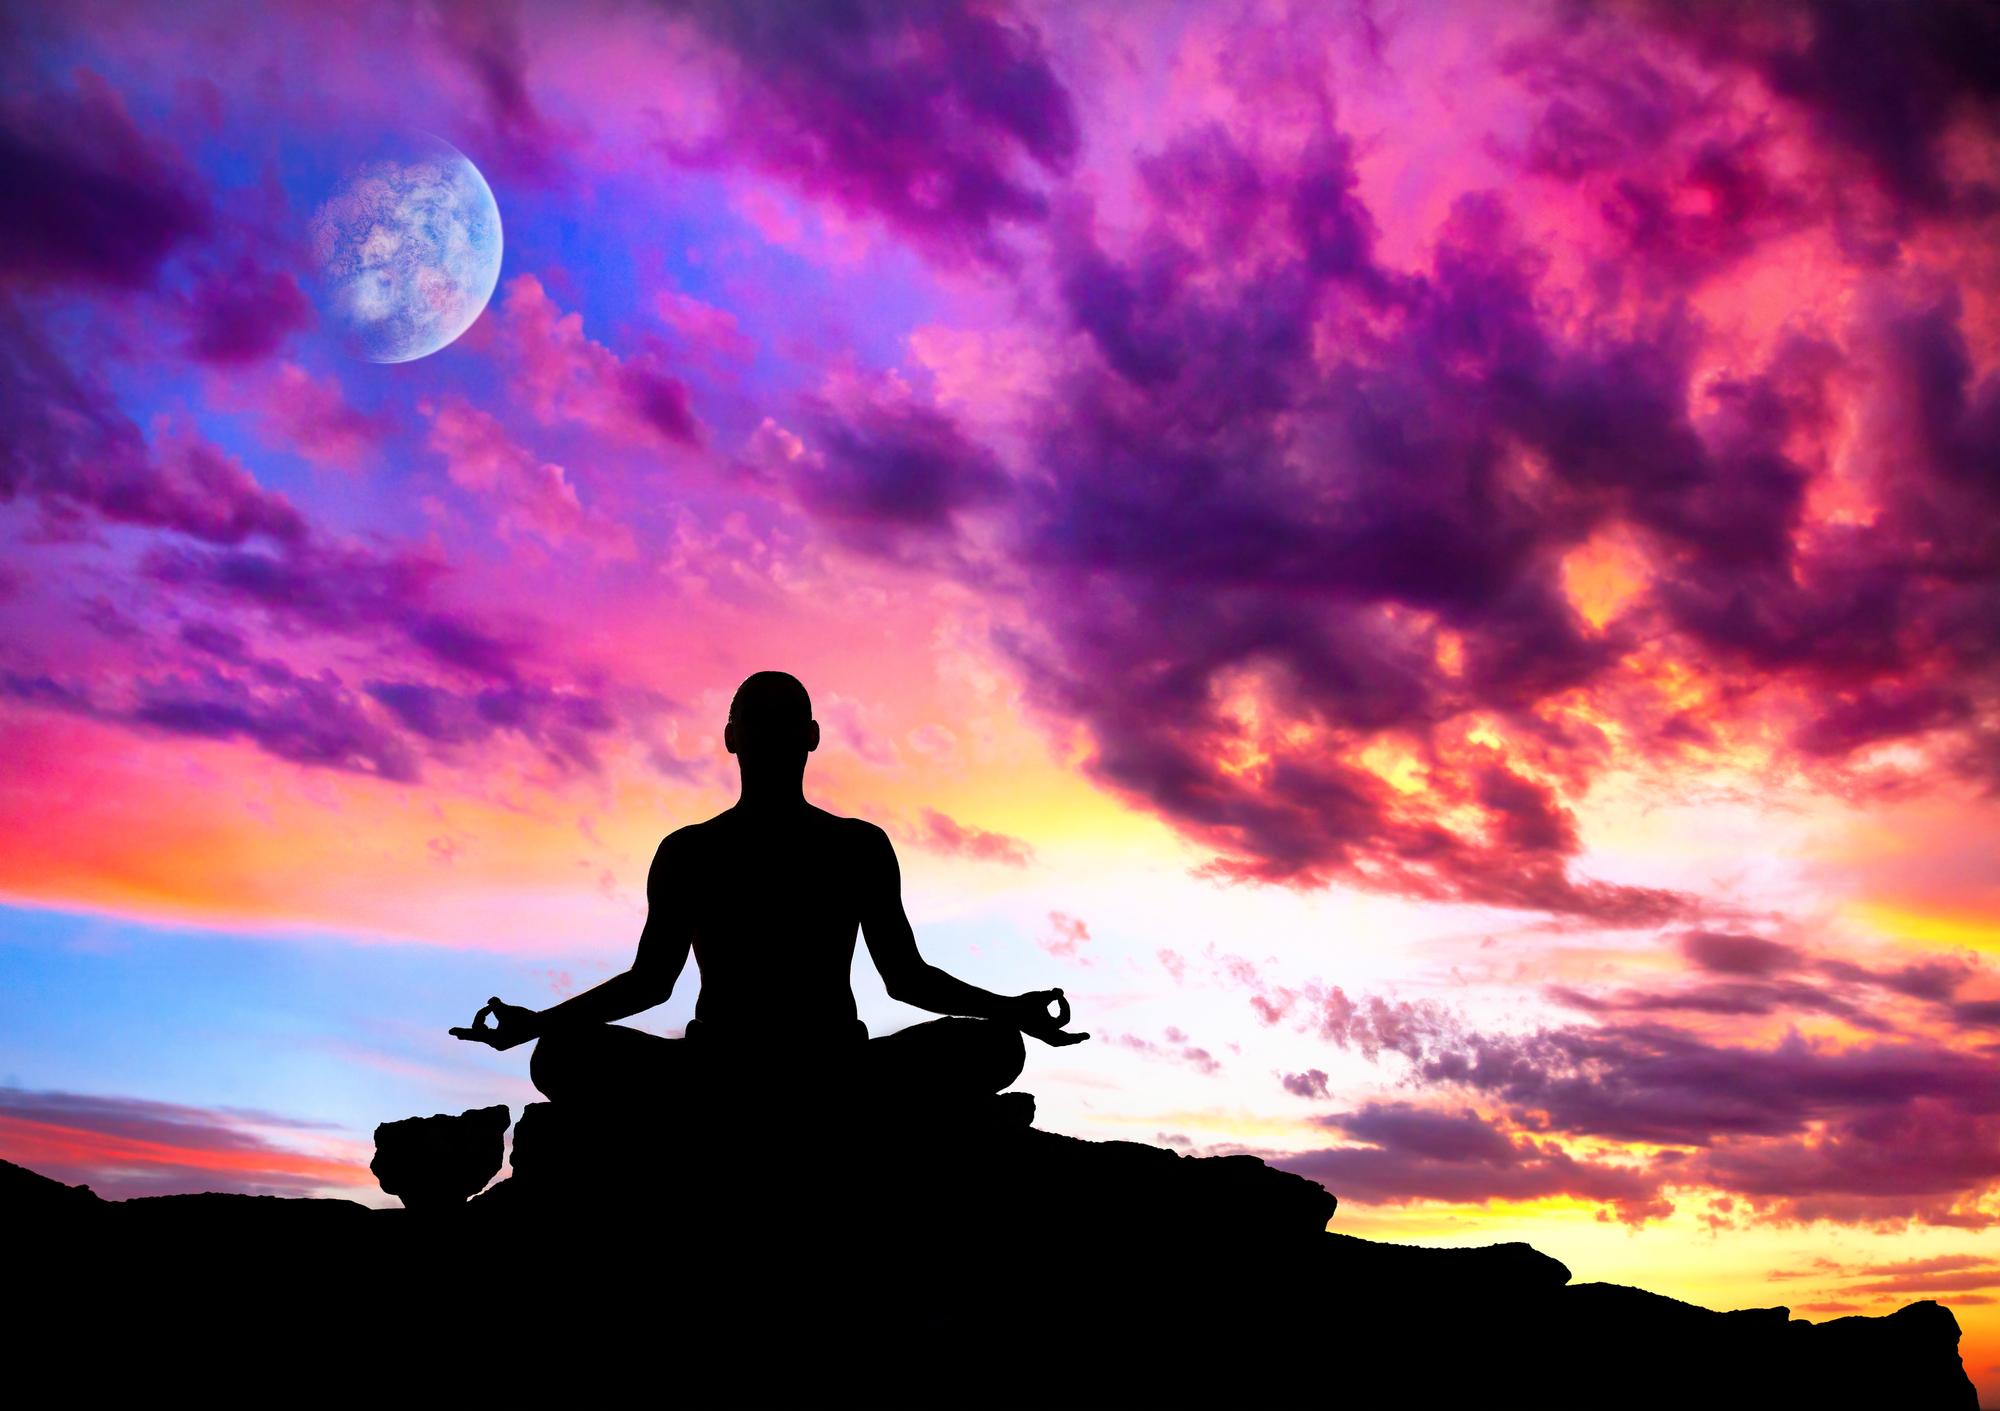 Thinking through my money strategy as I meditated.